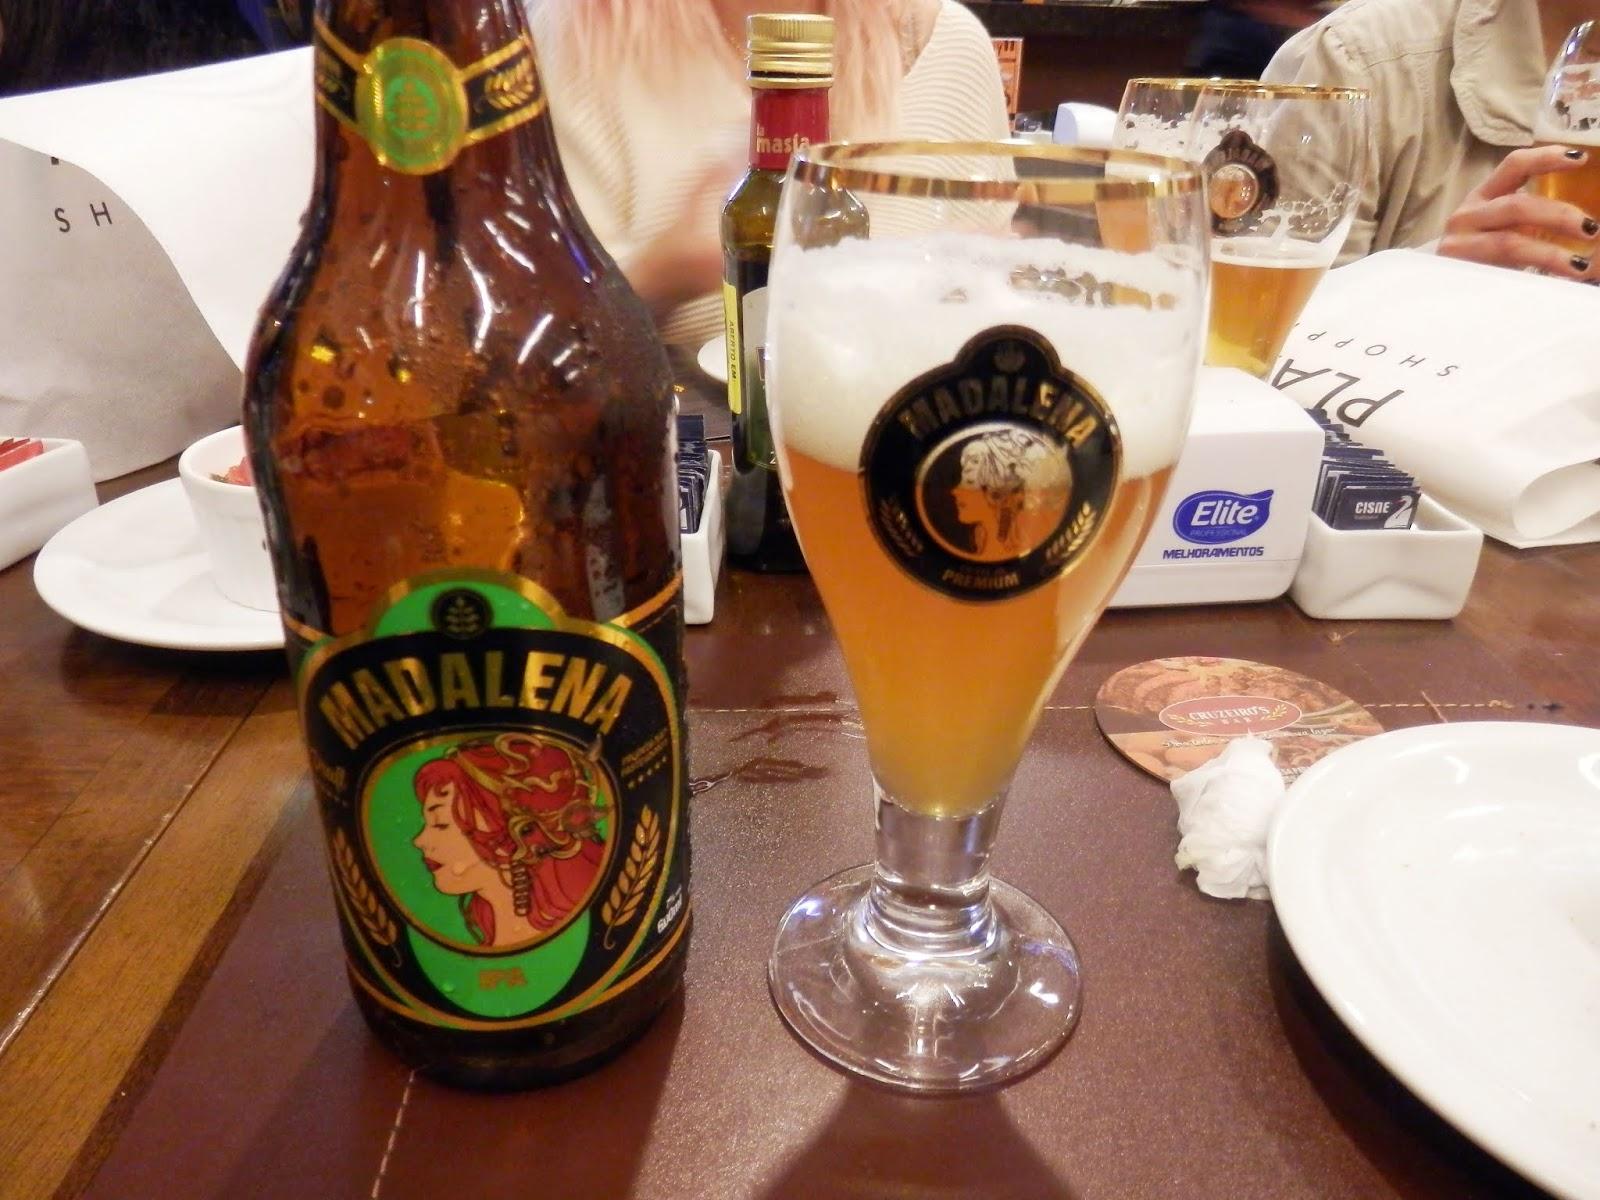 cerveja madalena santo andré